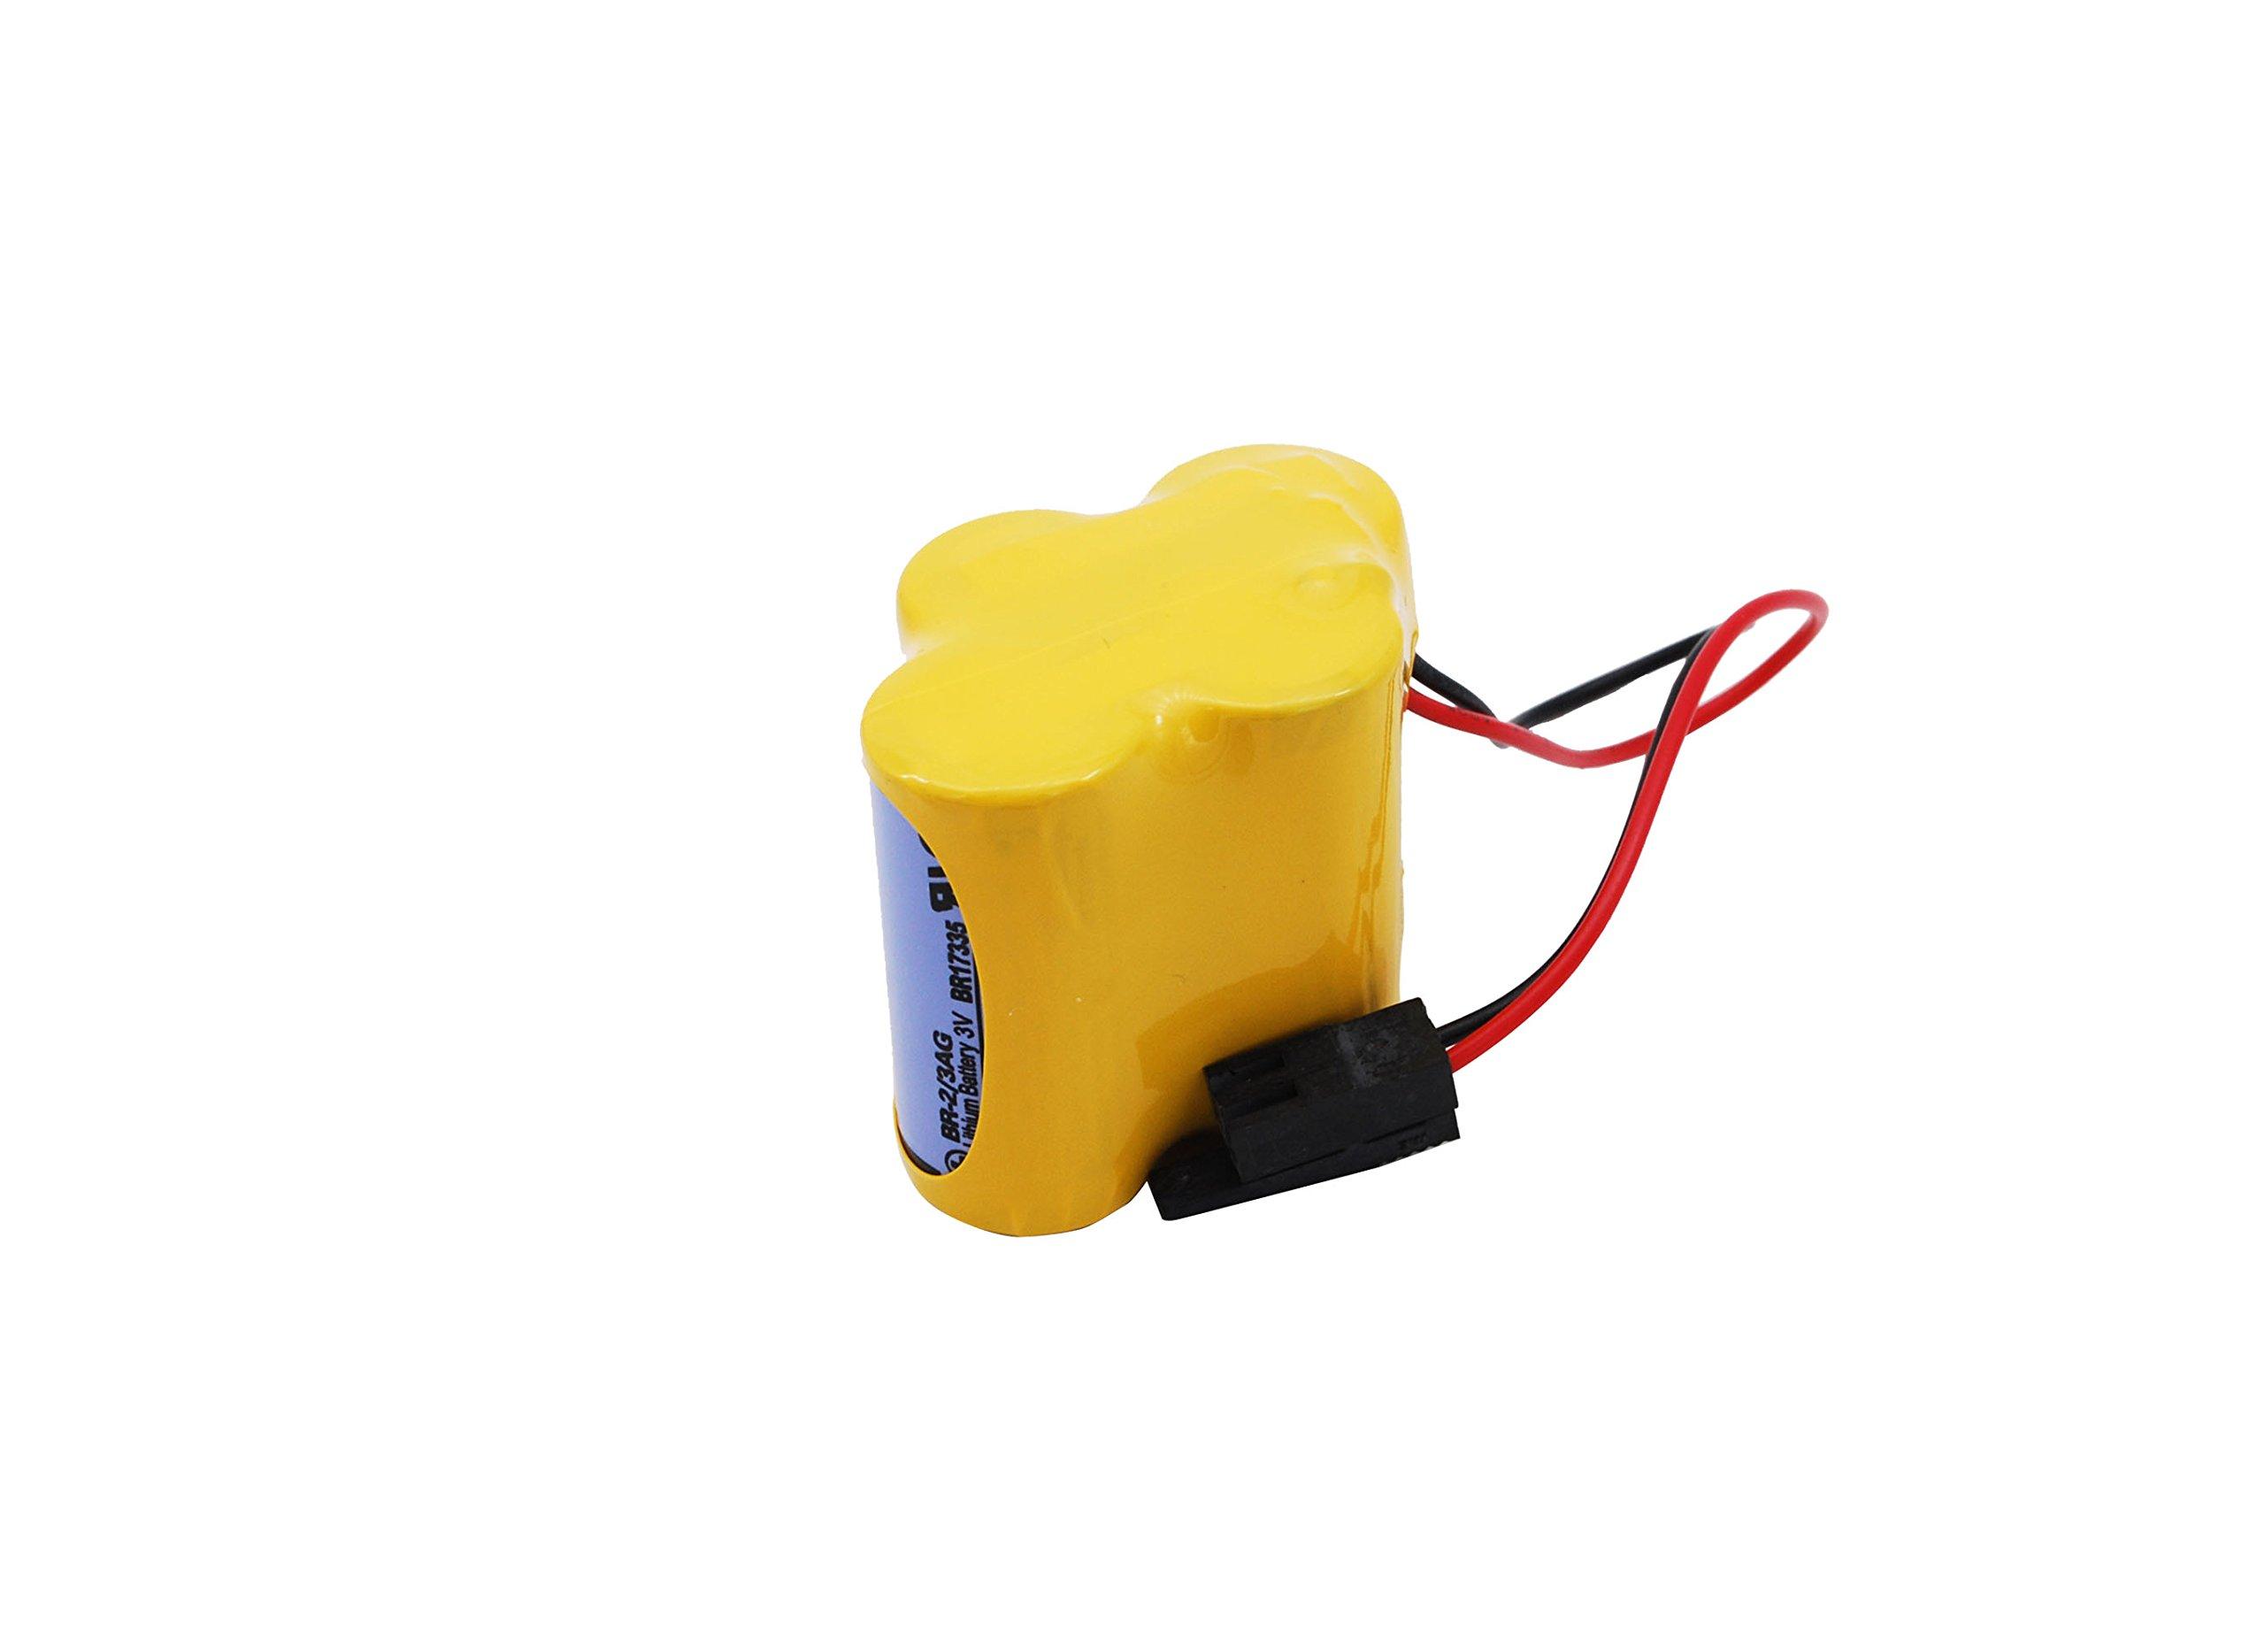 Bateria : Panasonic Br-2/3agct4a A98l-0031-0025